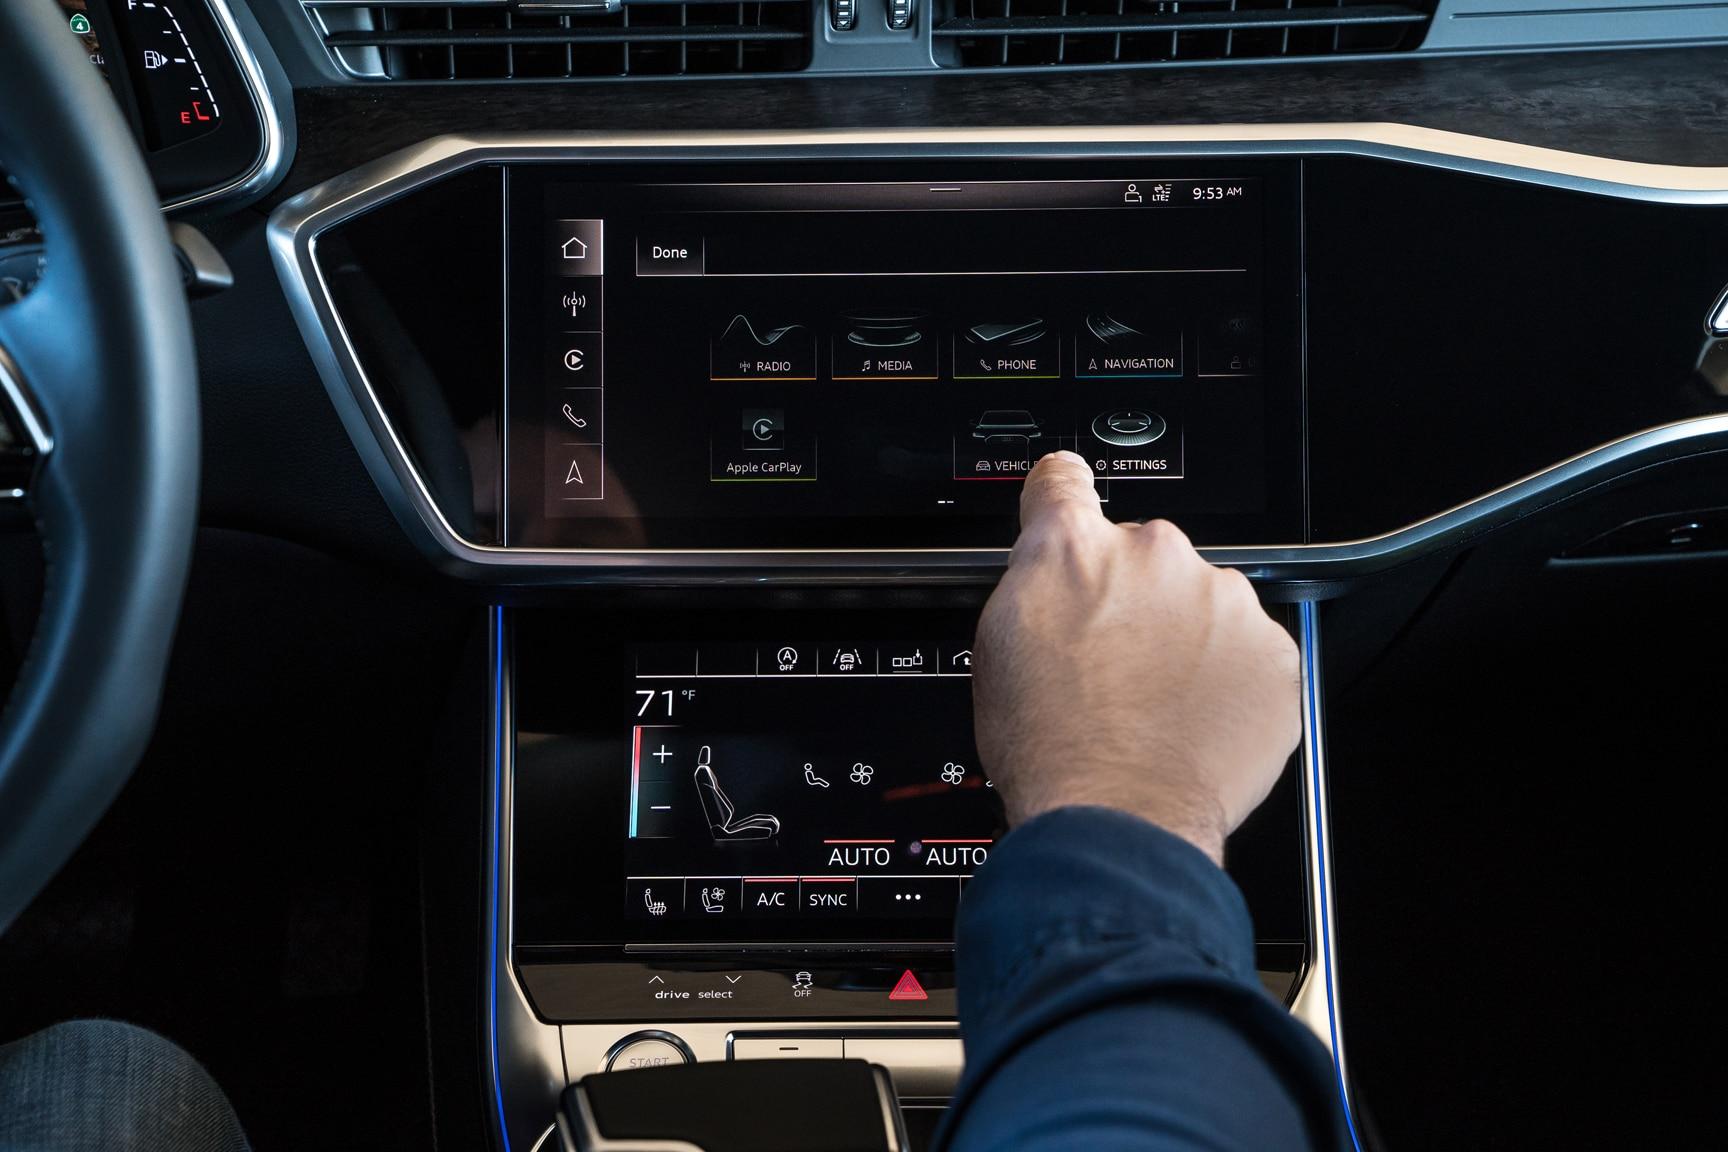 Audi Mmi Carplay Update